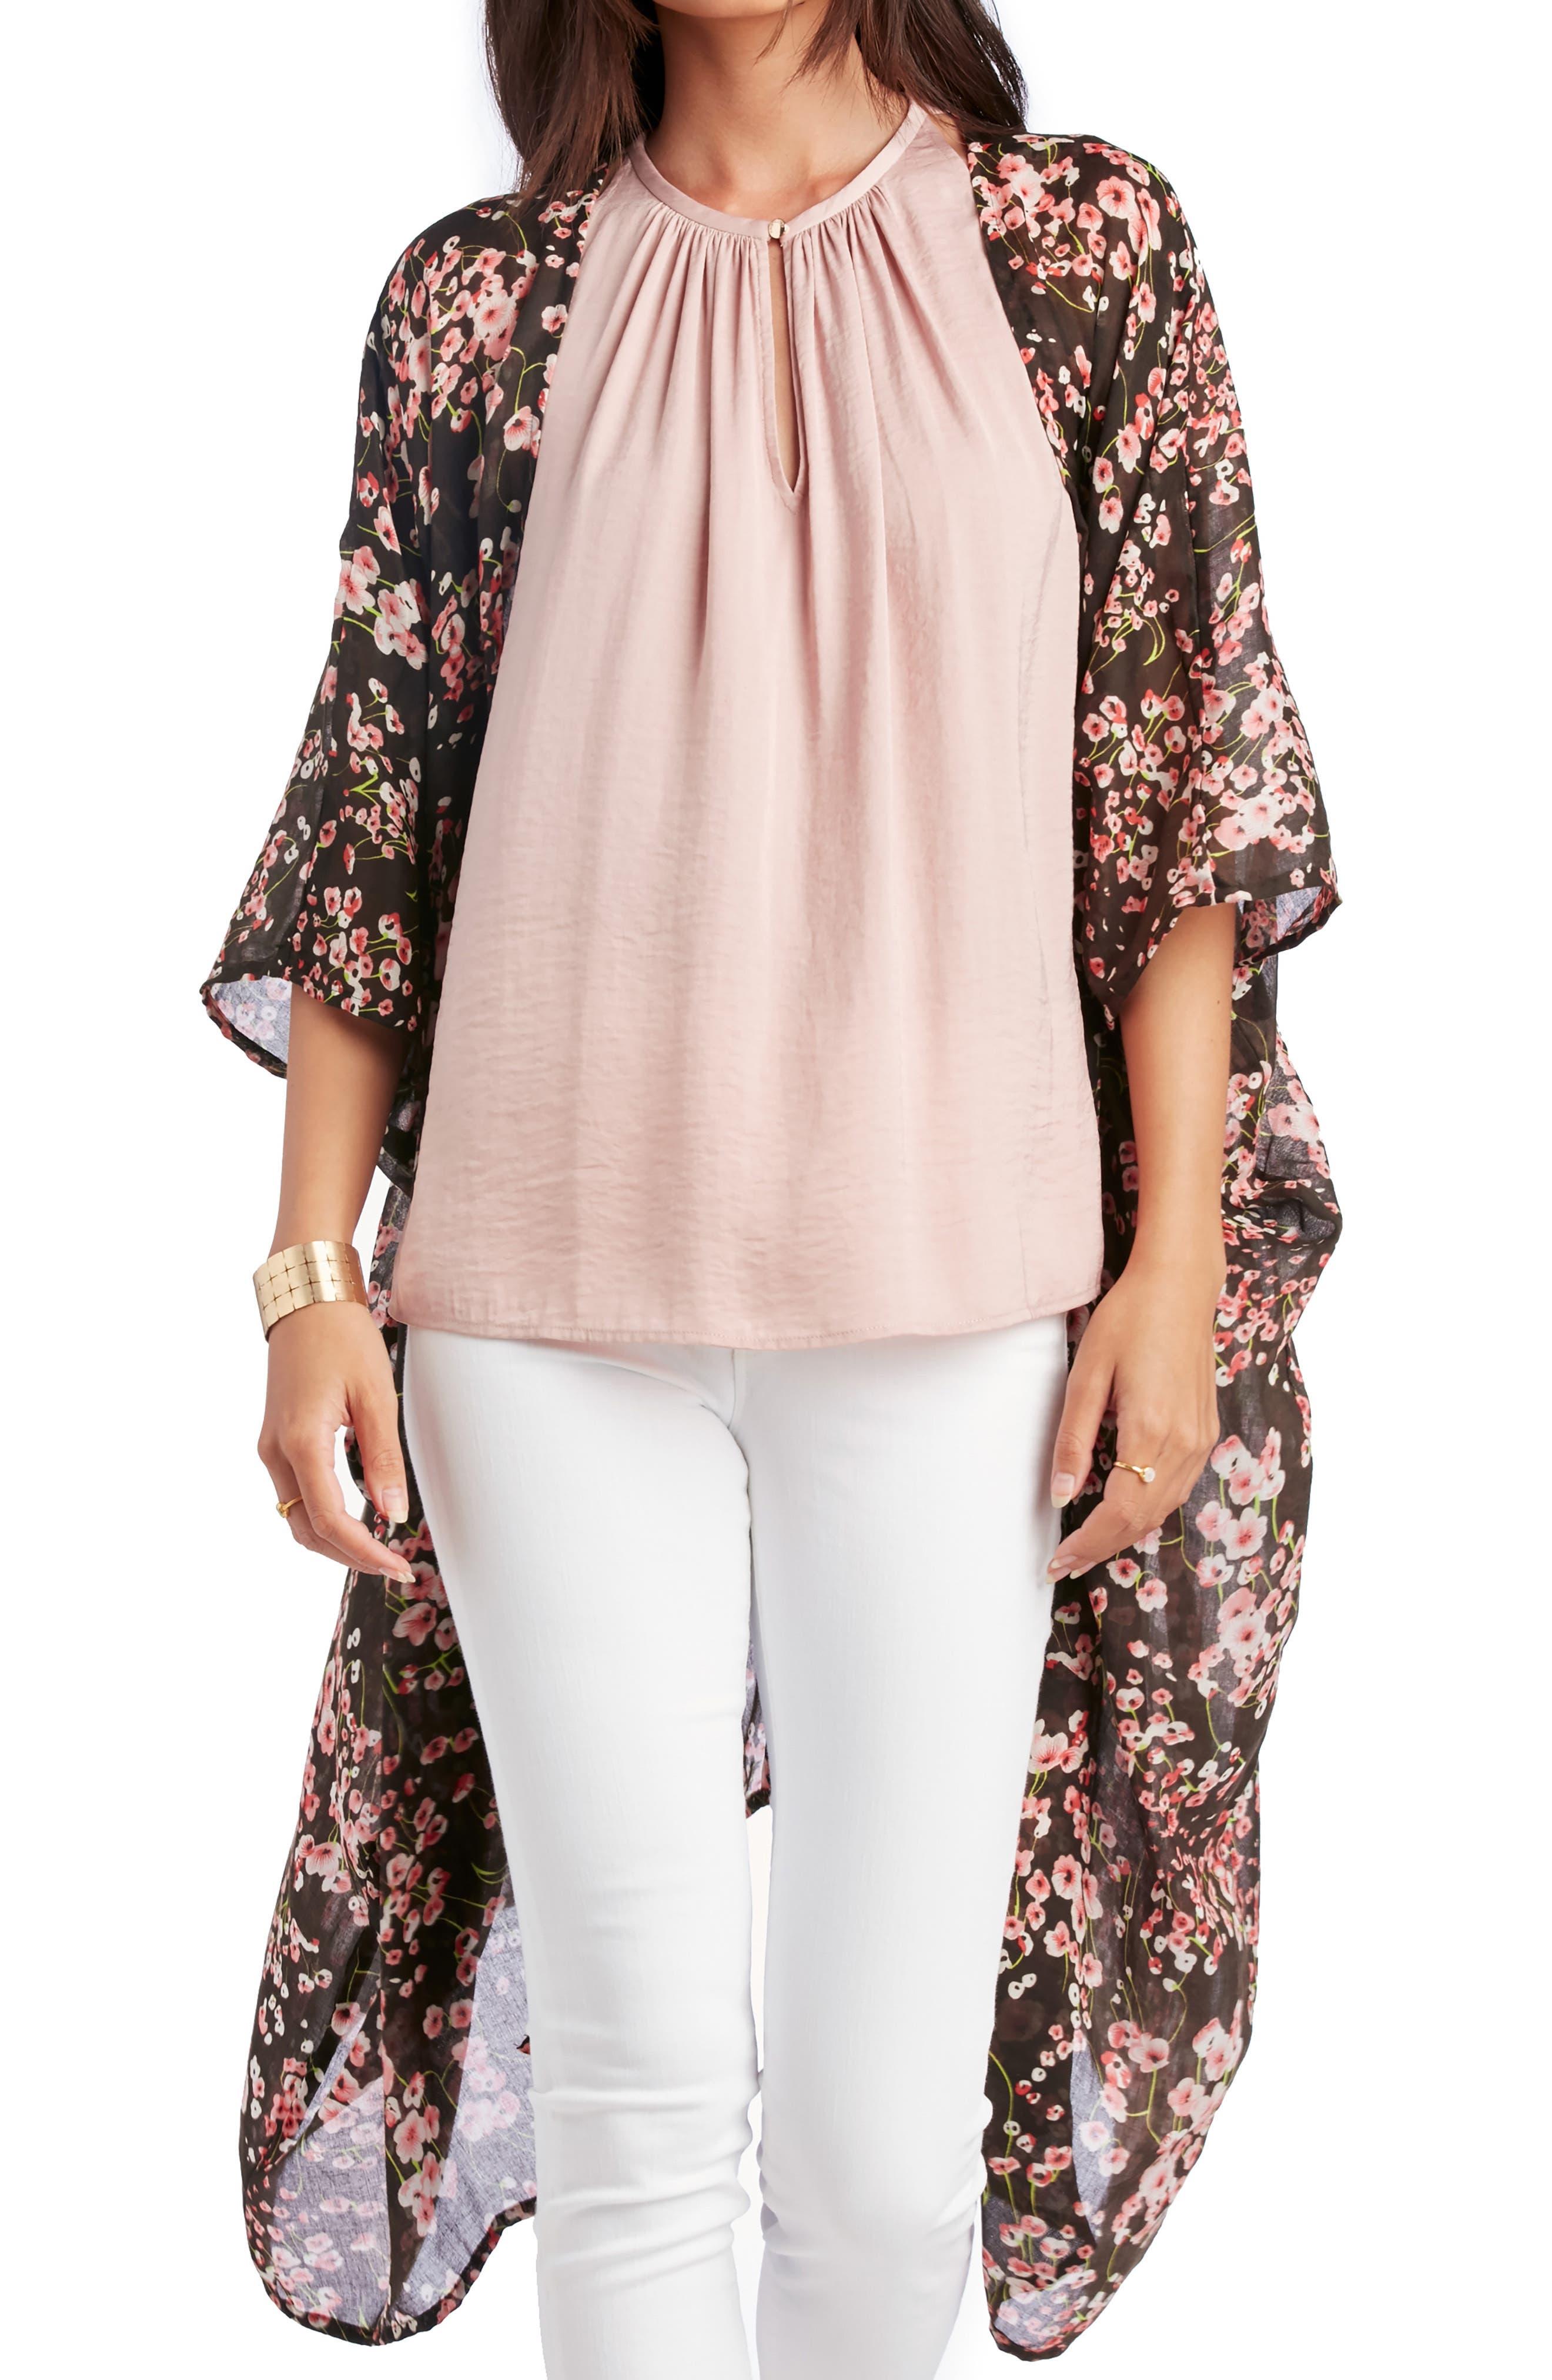 SOLE SOCIETY Cherry Blossom Kimono, Main, color, 002